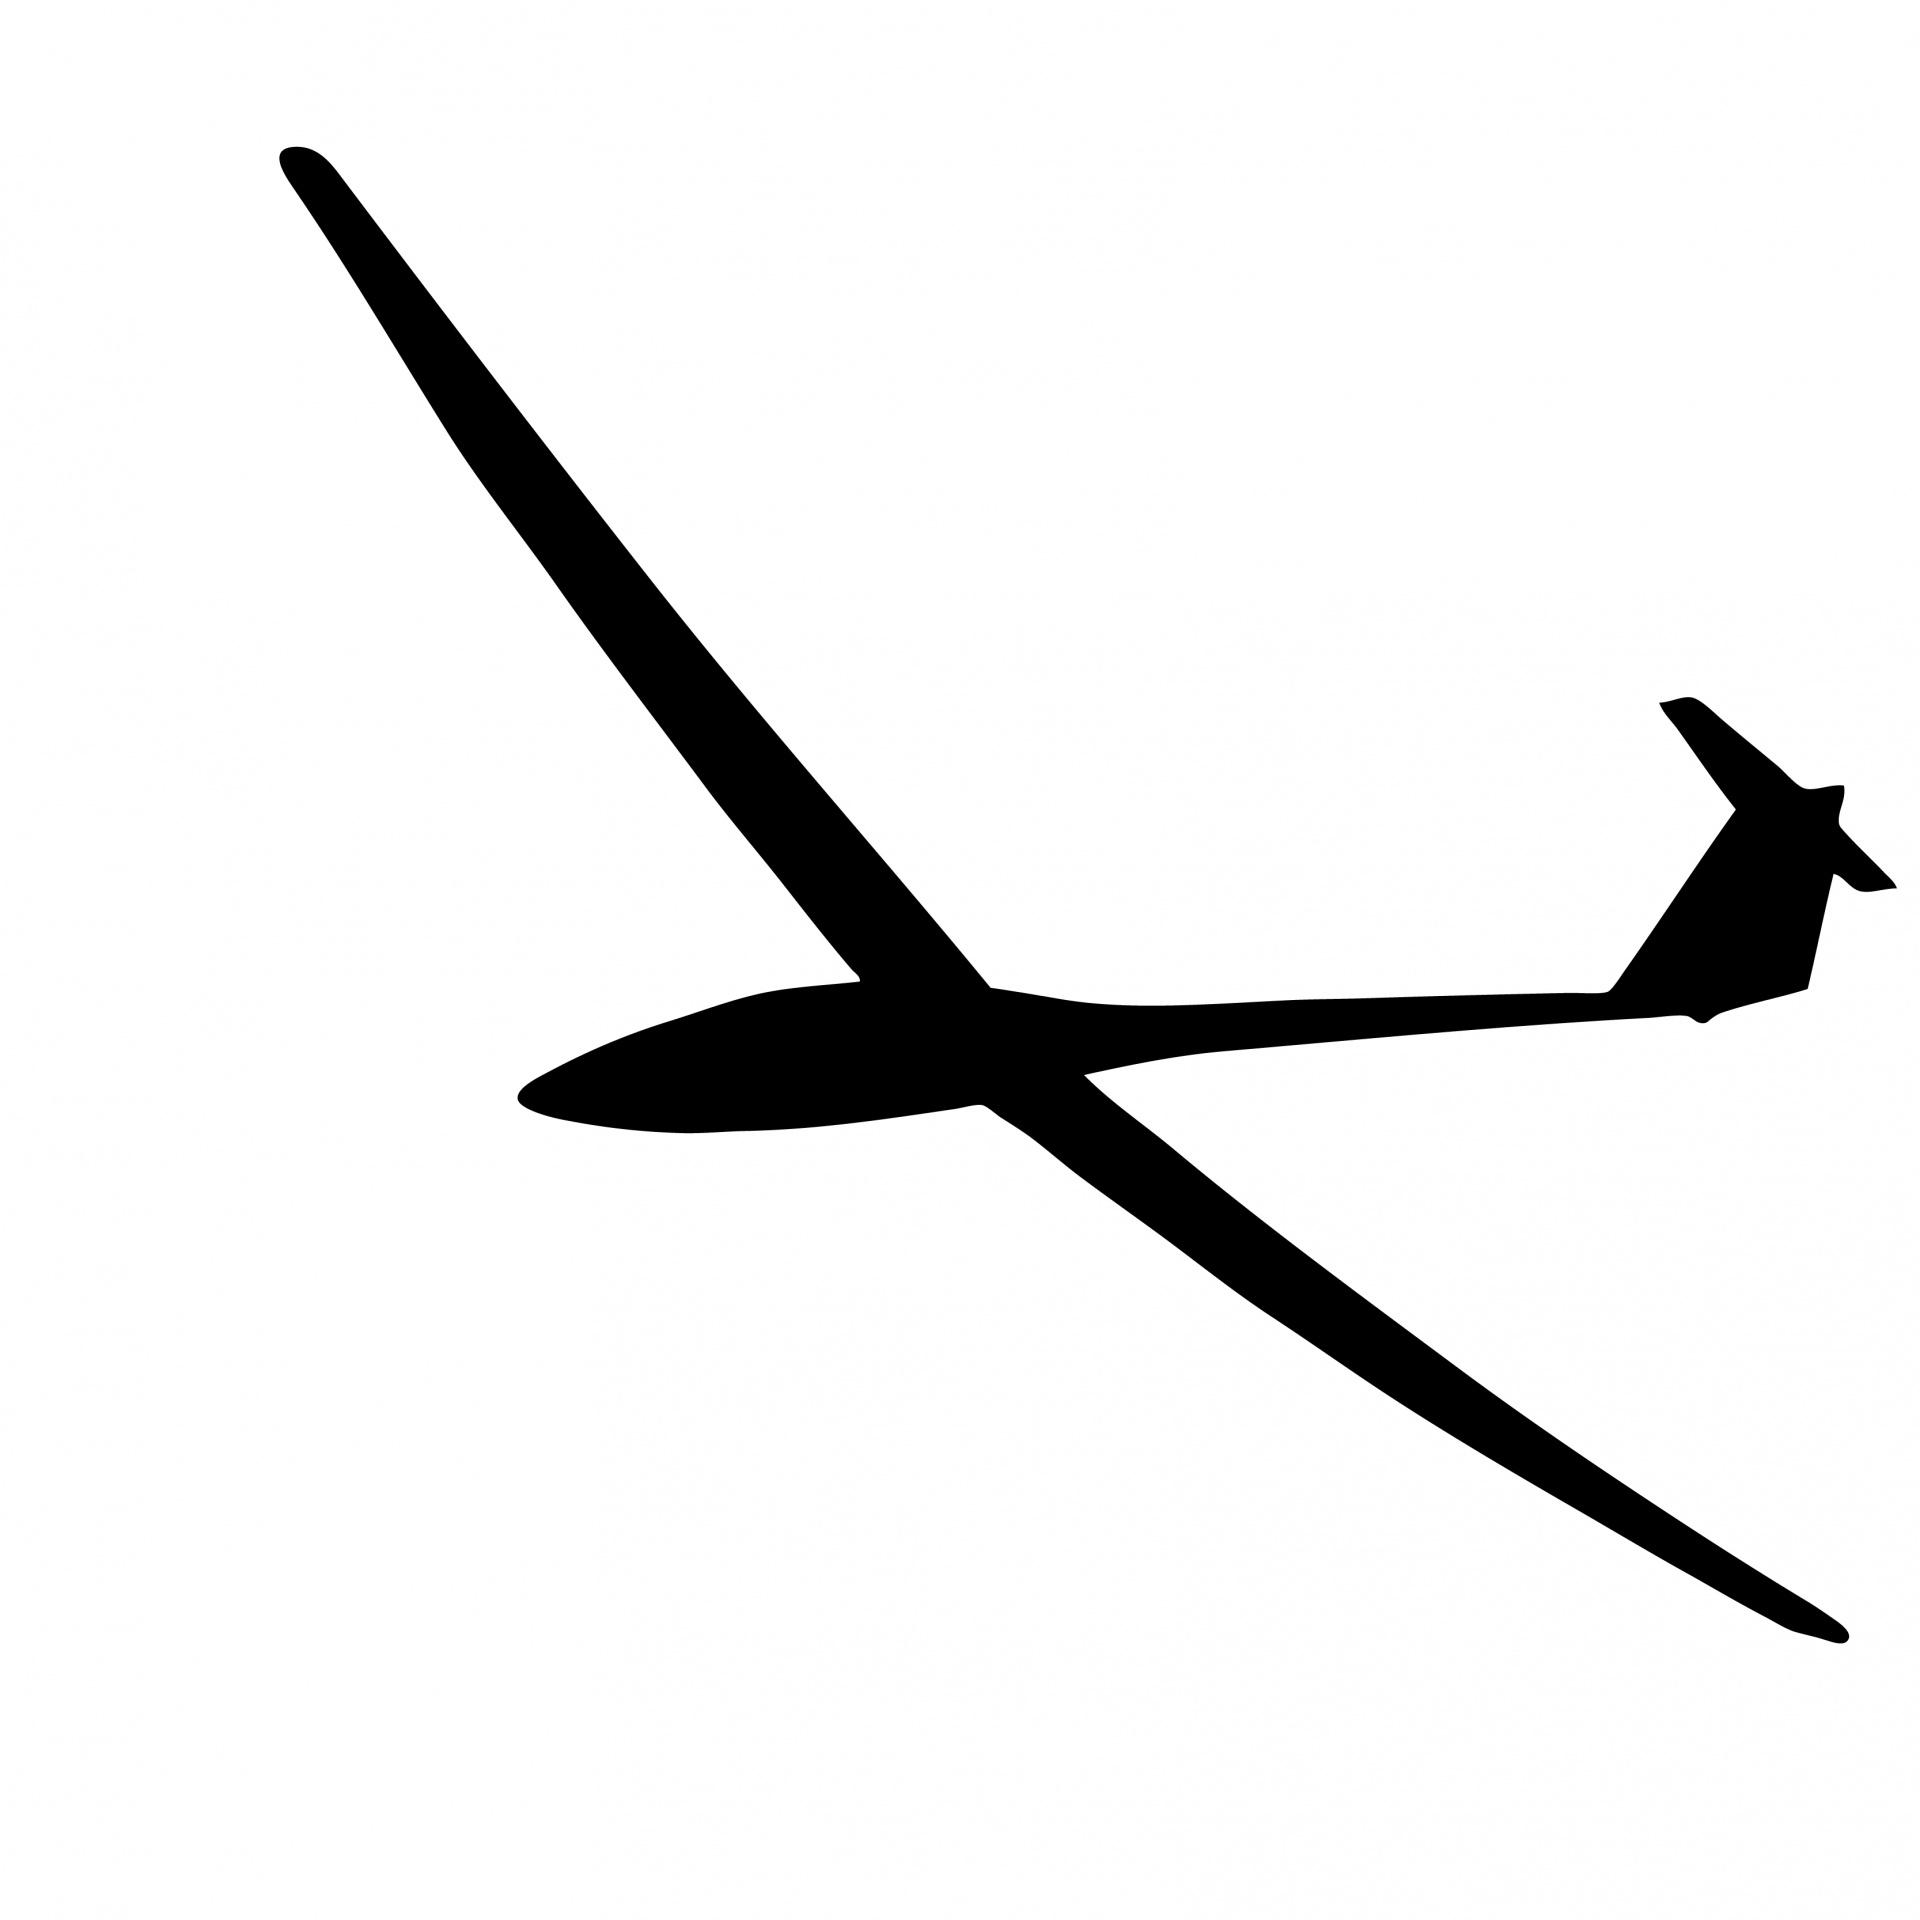 Glider Silhouette Free Stock Photo